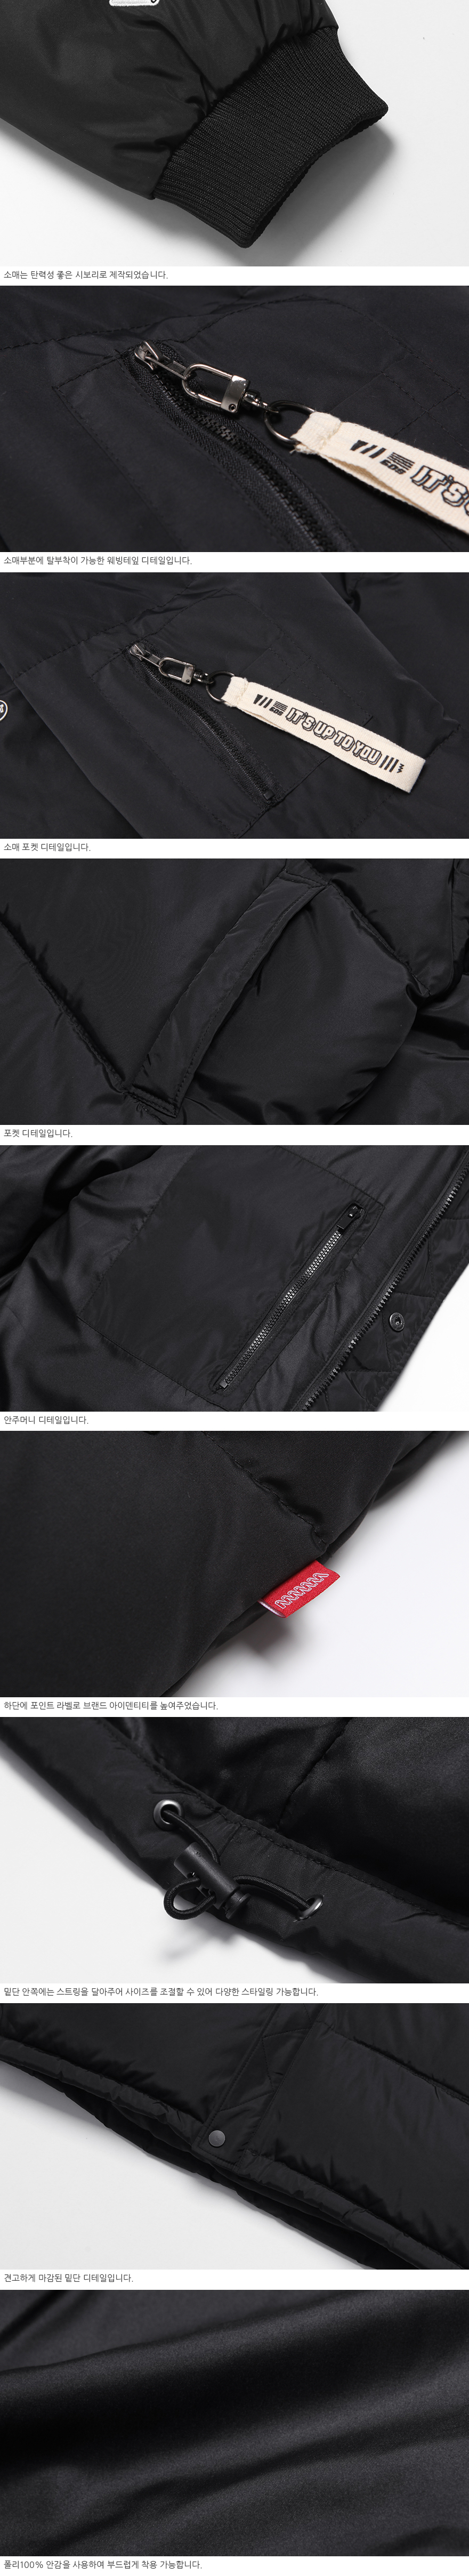 MJOT7212_detail_black_02.jpg